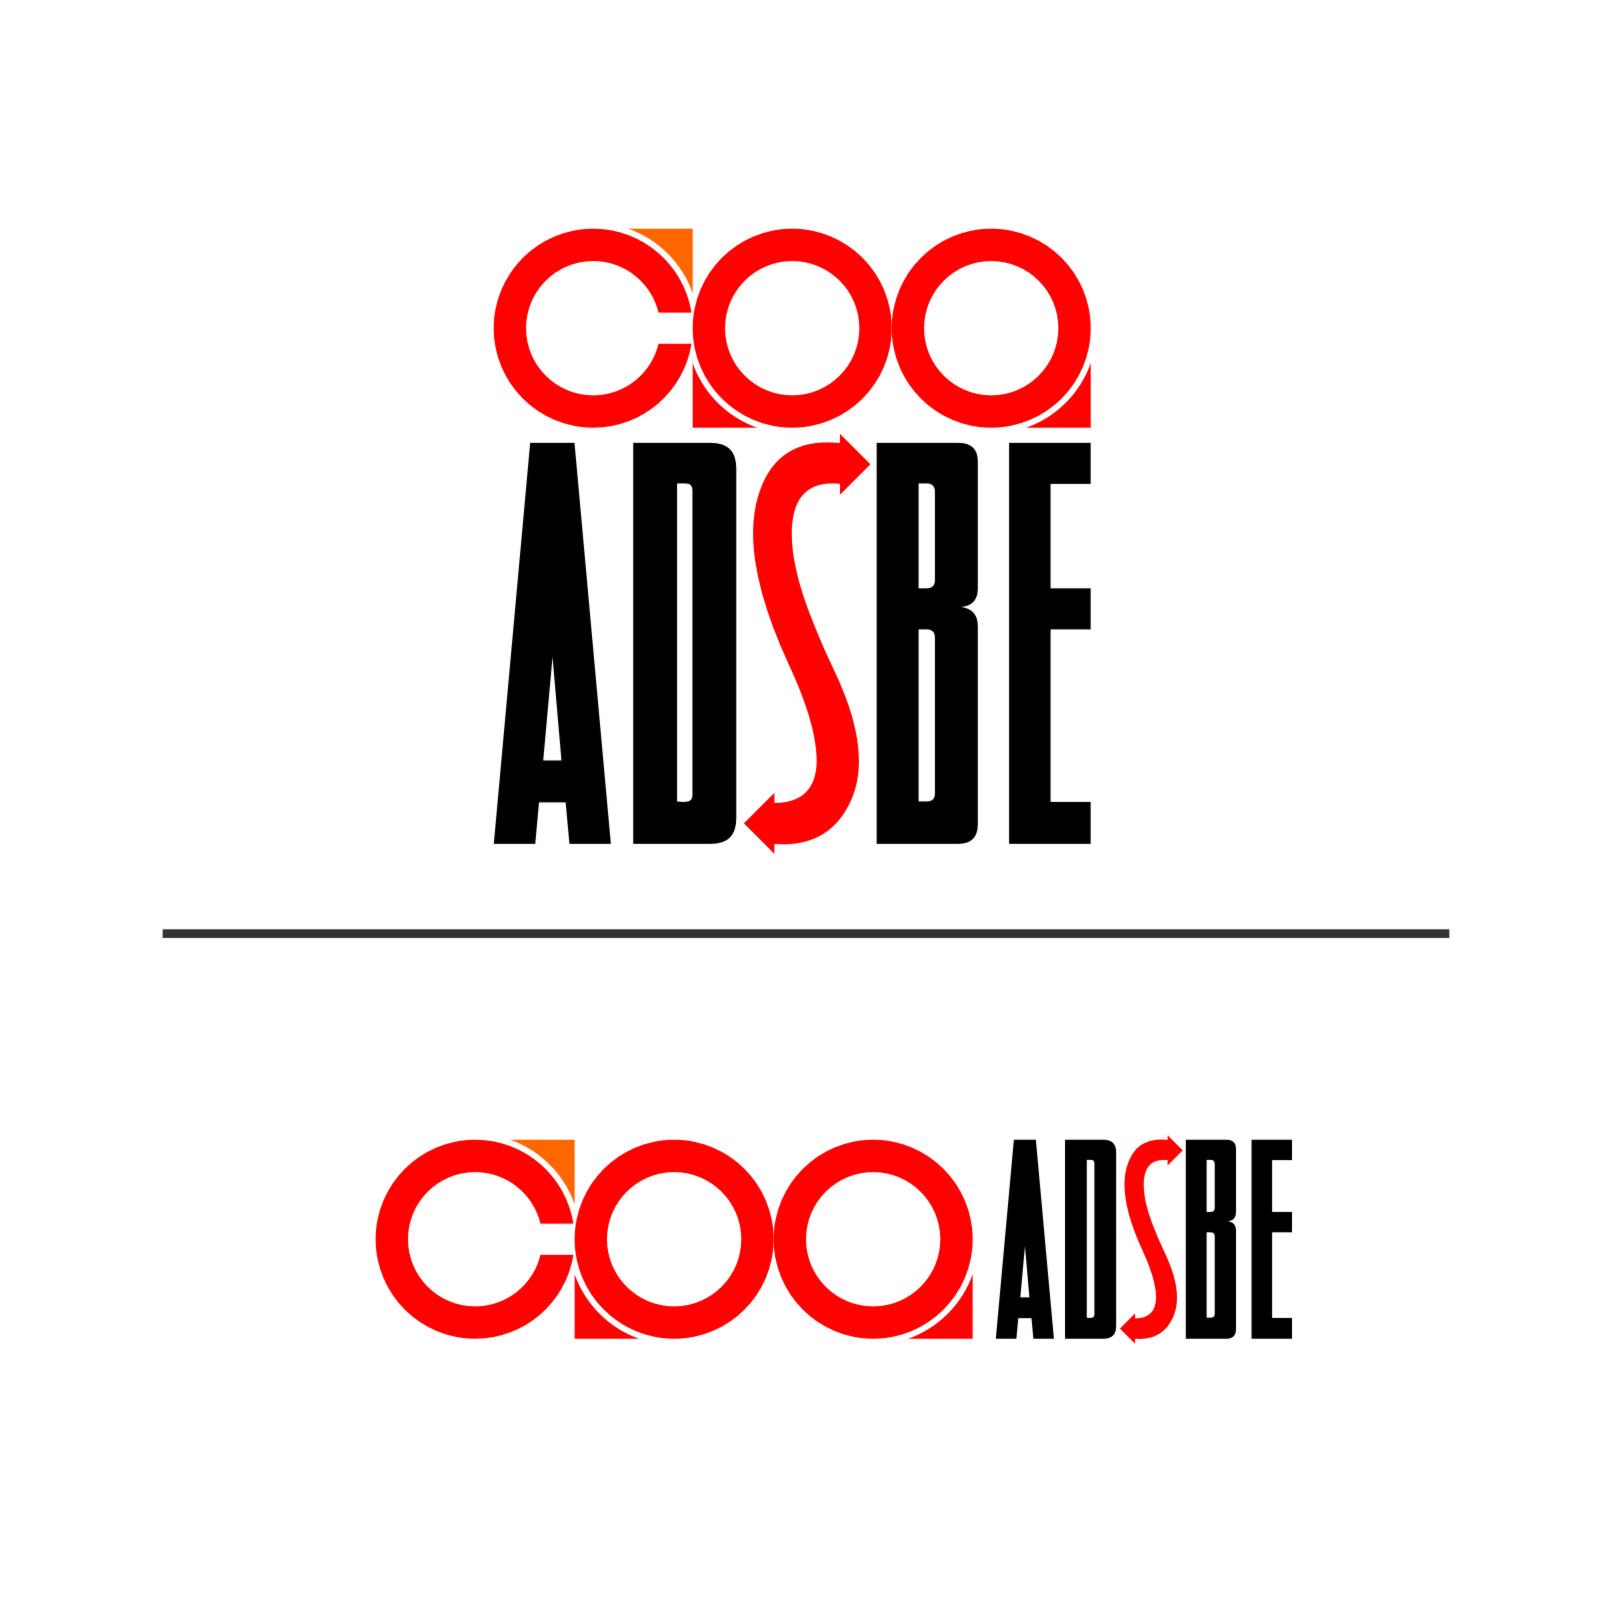 Разработка логотипа для CPA-сети фото f_873586230be02452.jpg